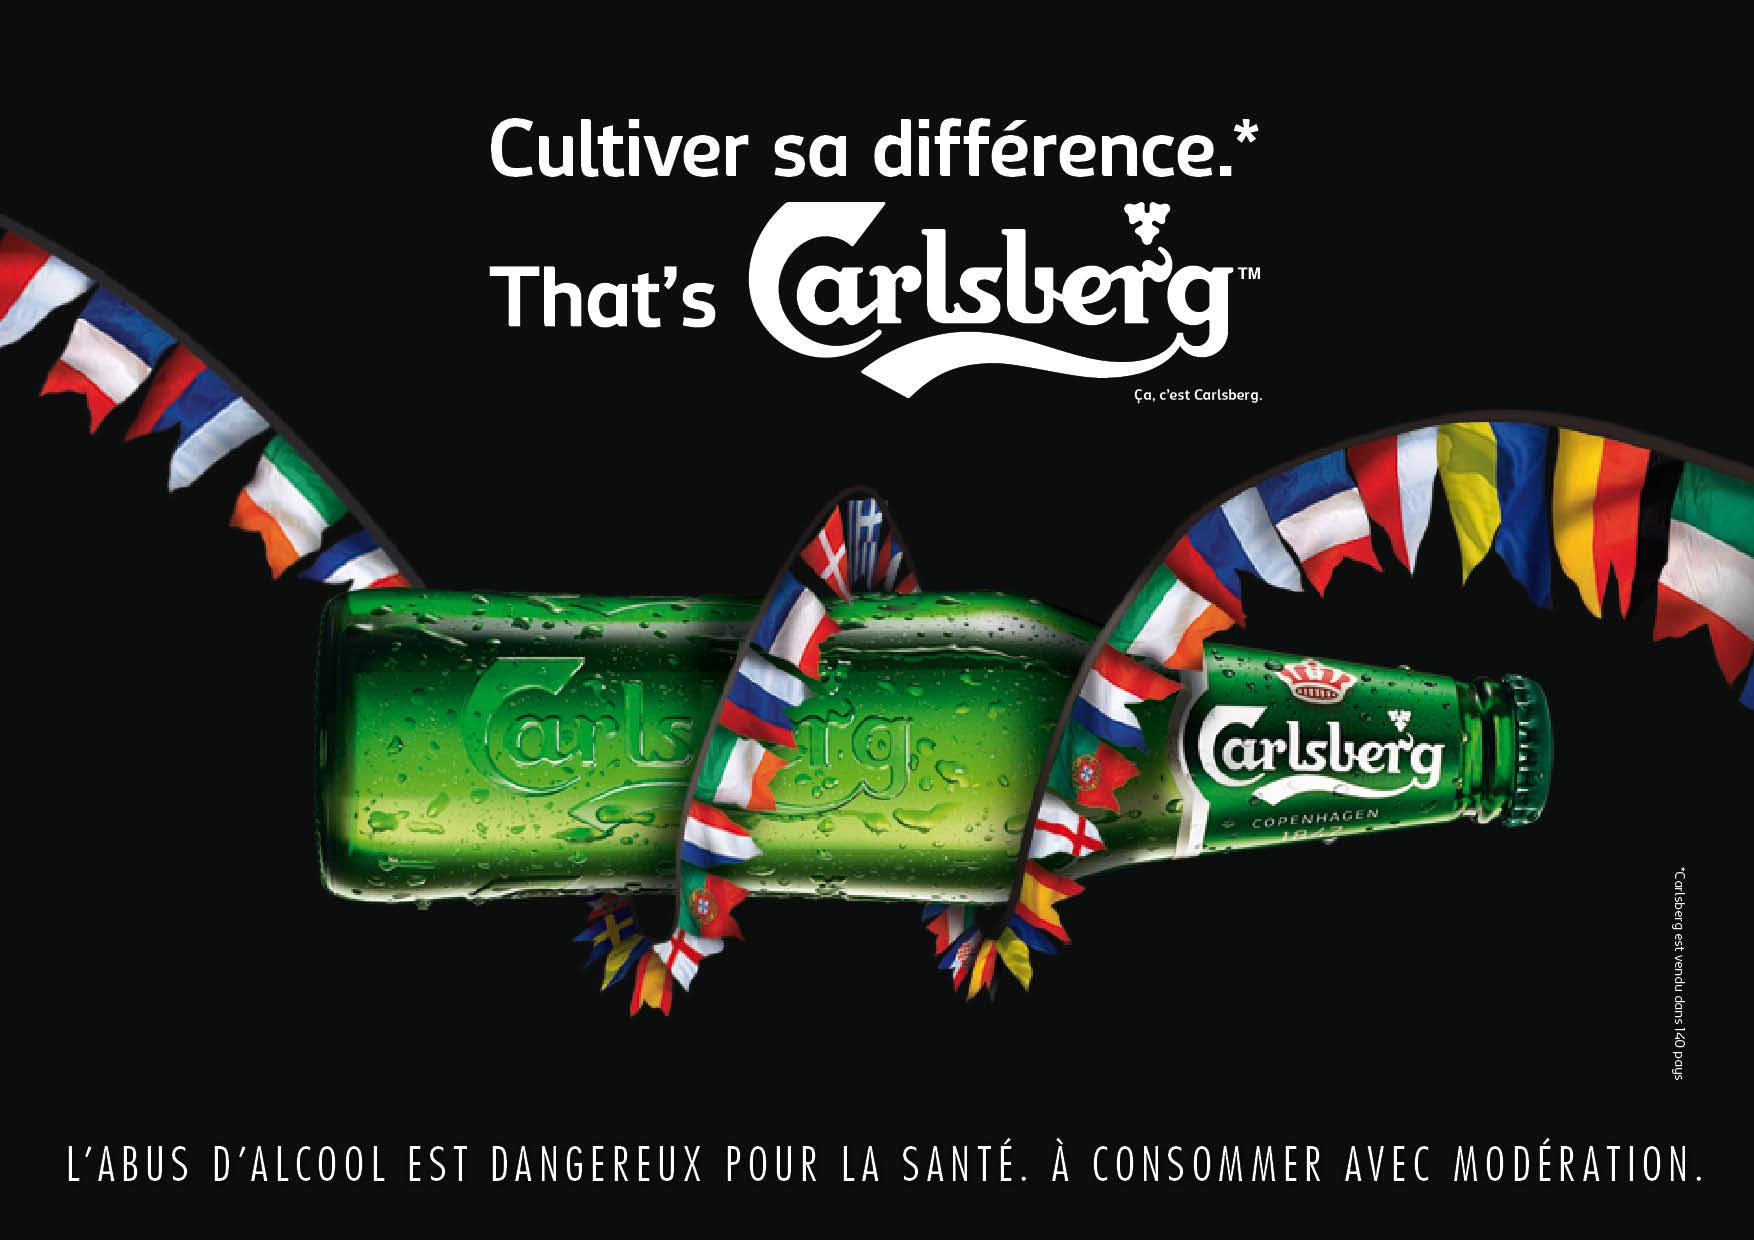 Les Papotages de Nana - Carlsberg